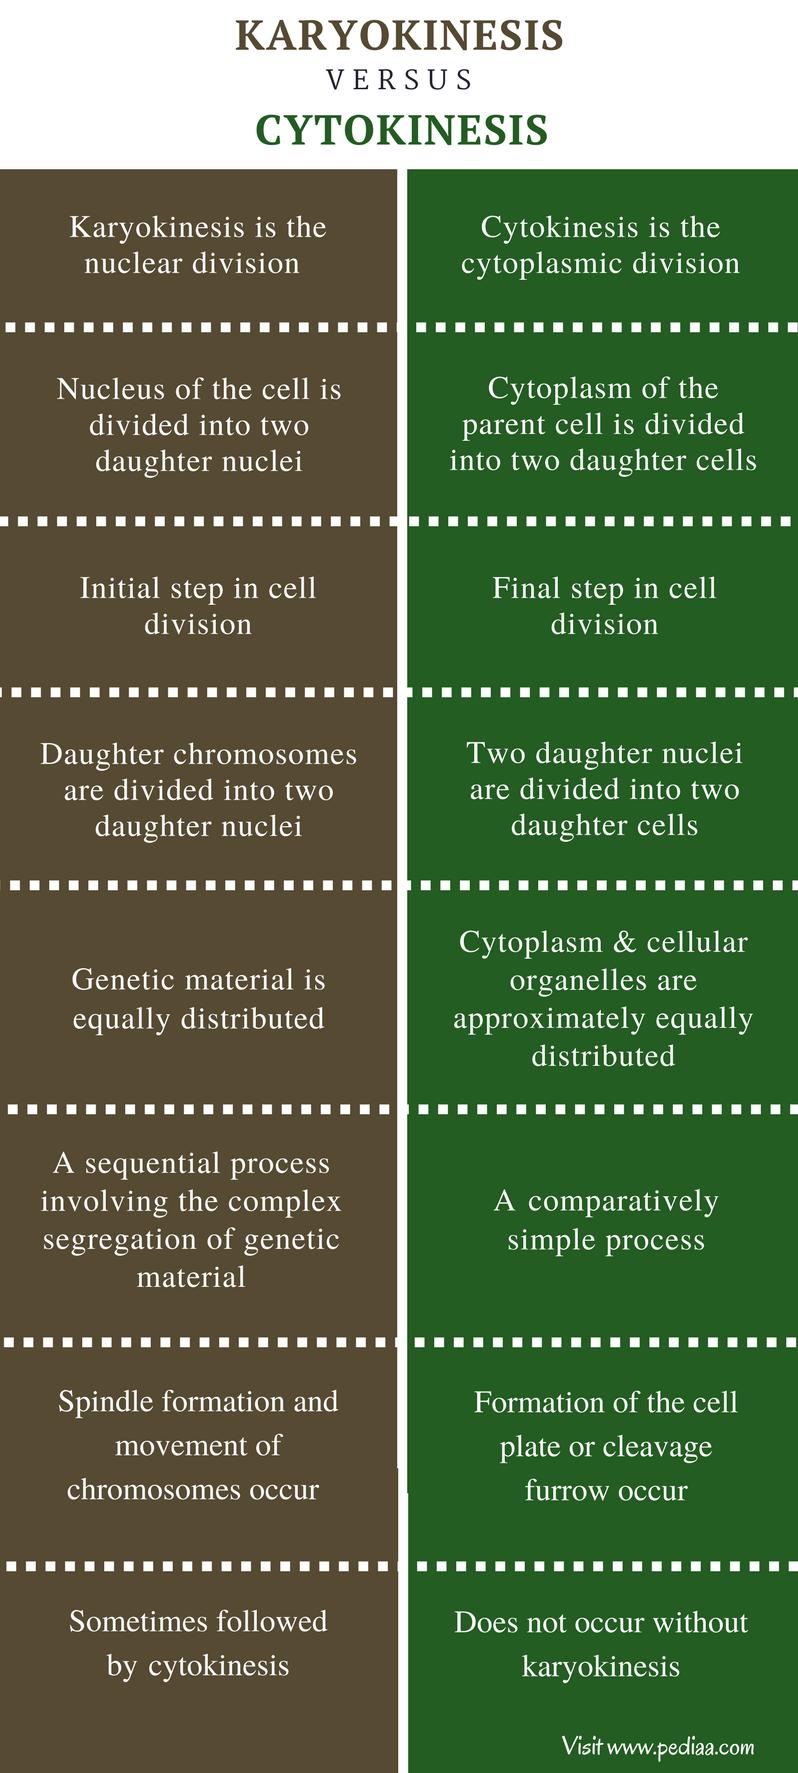 Difference Between Karyokinesis and Cytokinesis - Comparison Summary